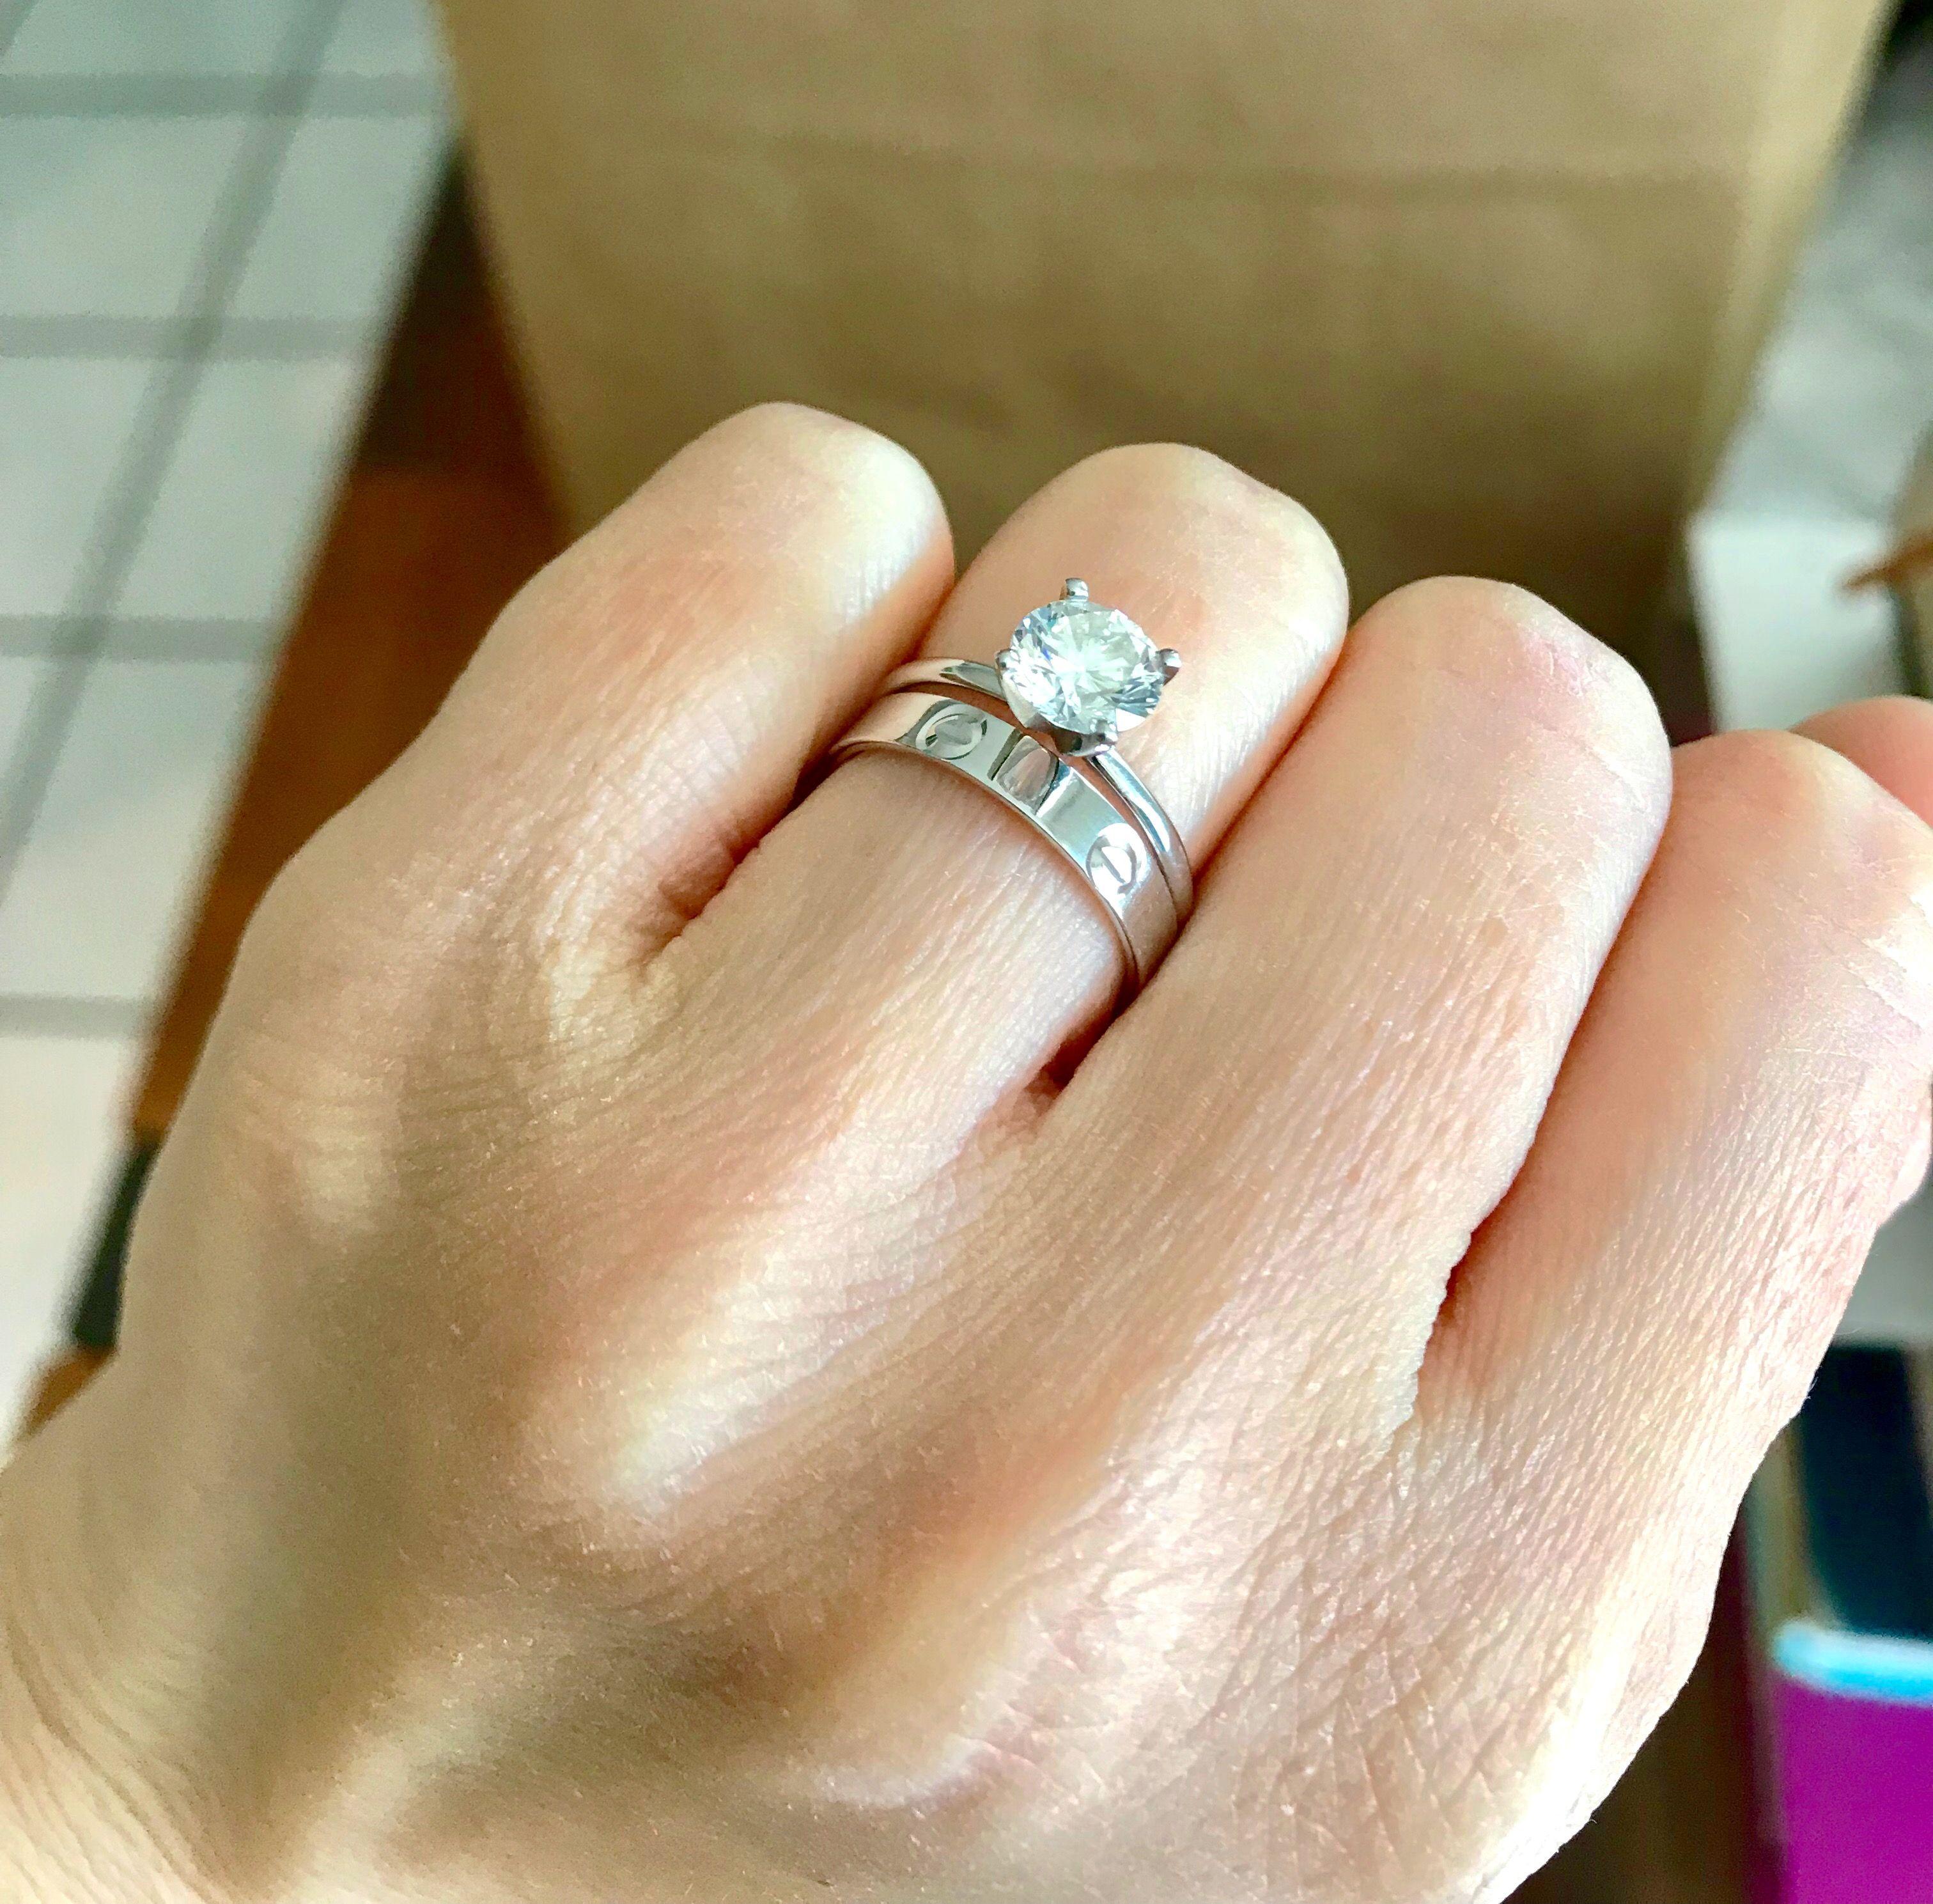 Platinum Diamond Solitaire Ring Cartier Wedding Band Cartier Wedding Bands Wedding Ring Bands Cartier Love Wedding Band